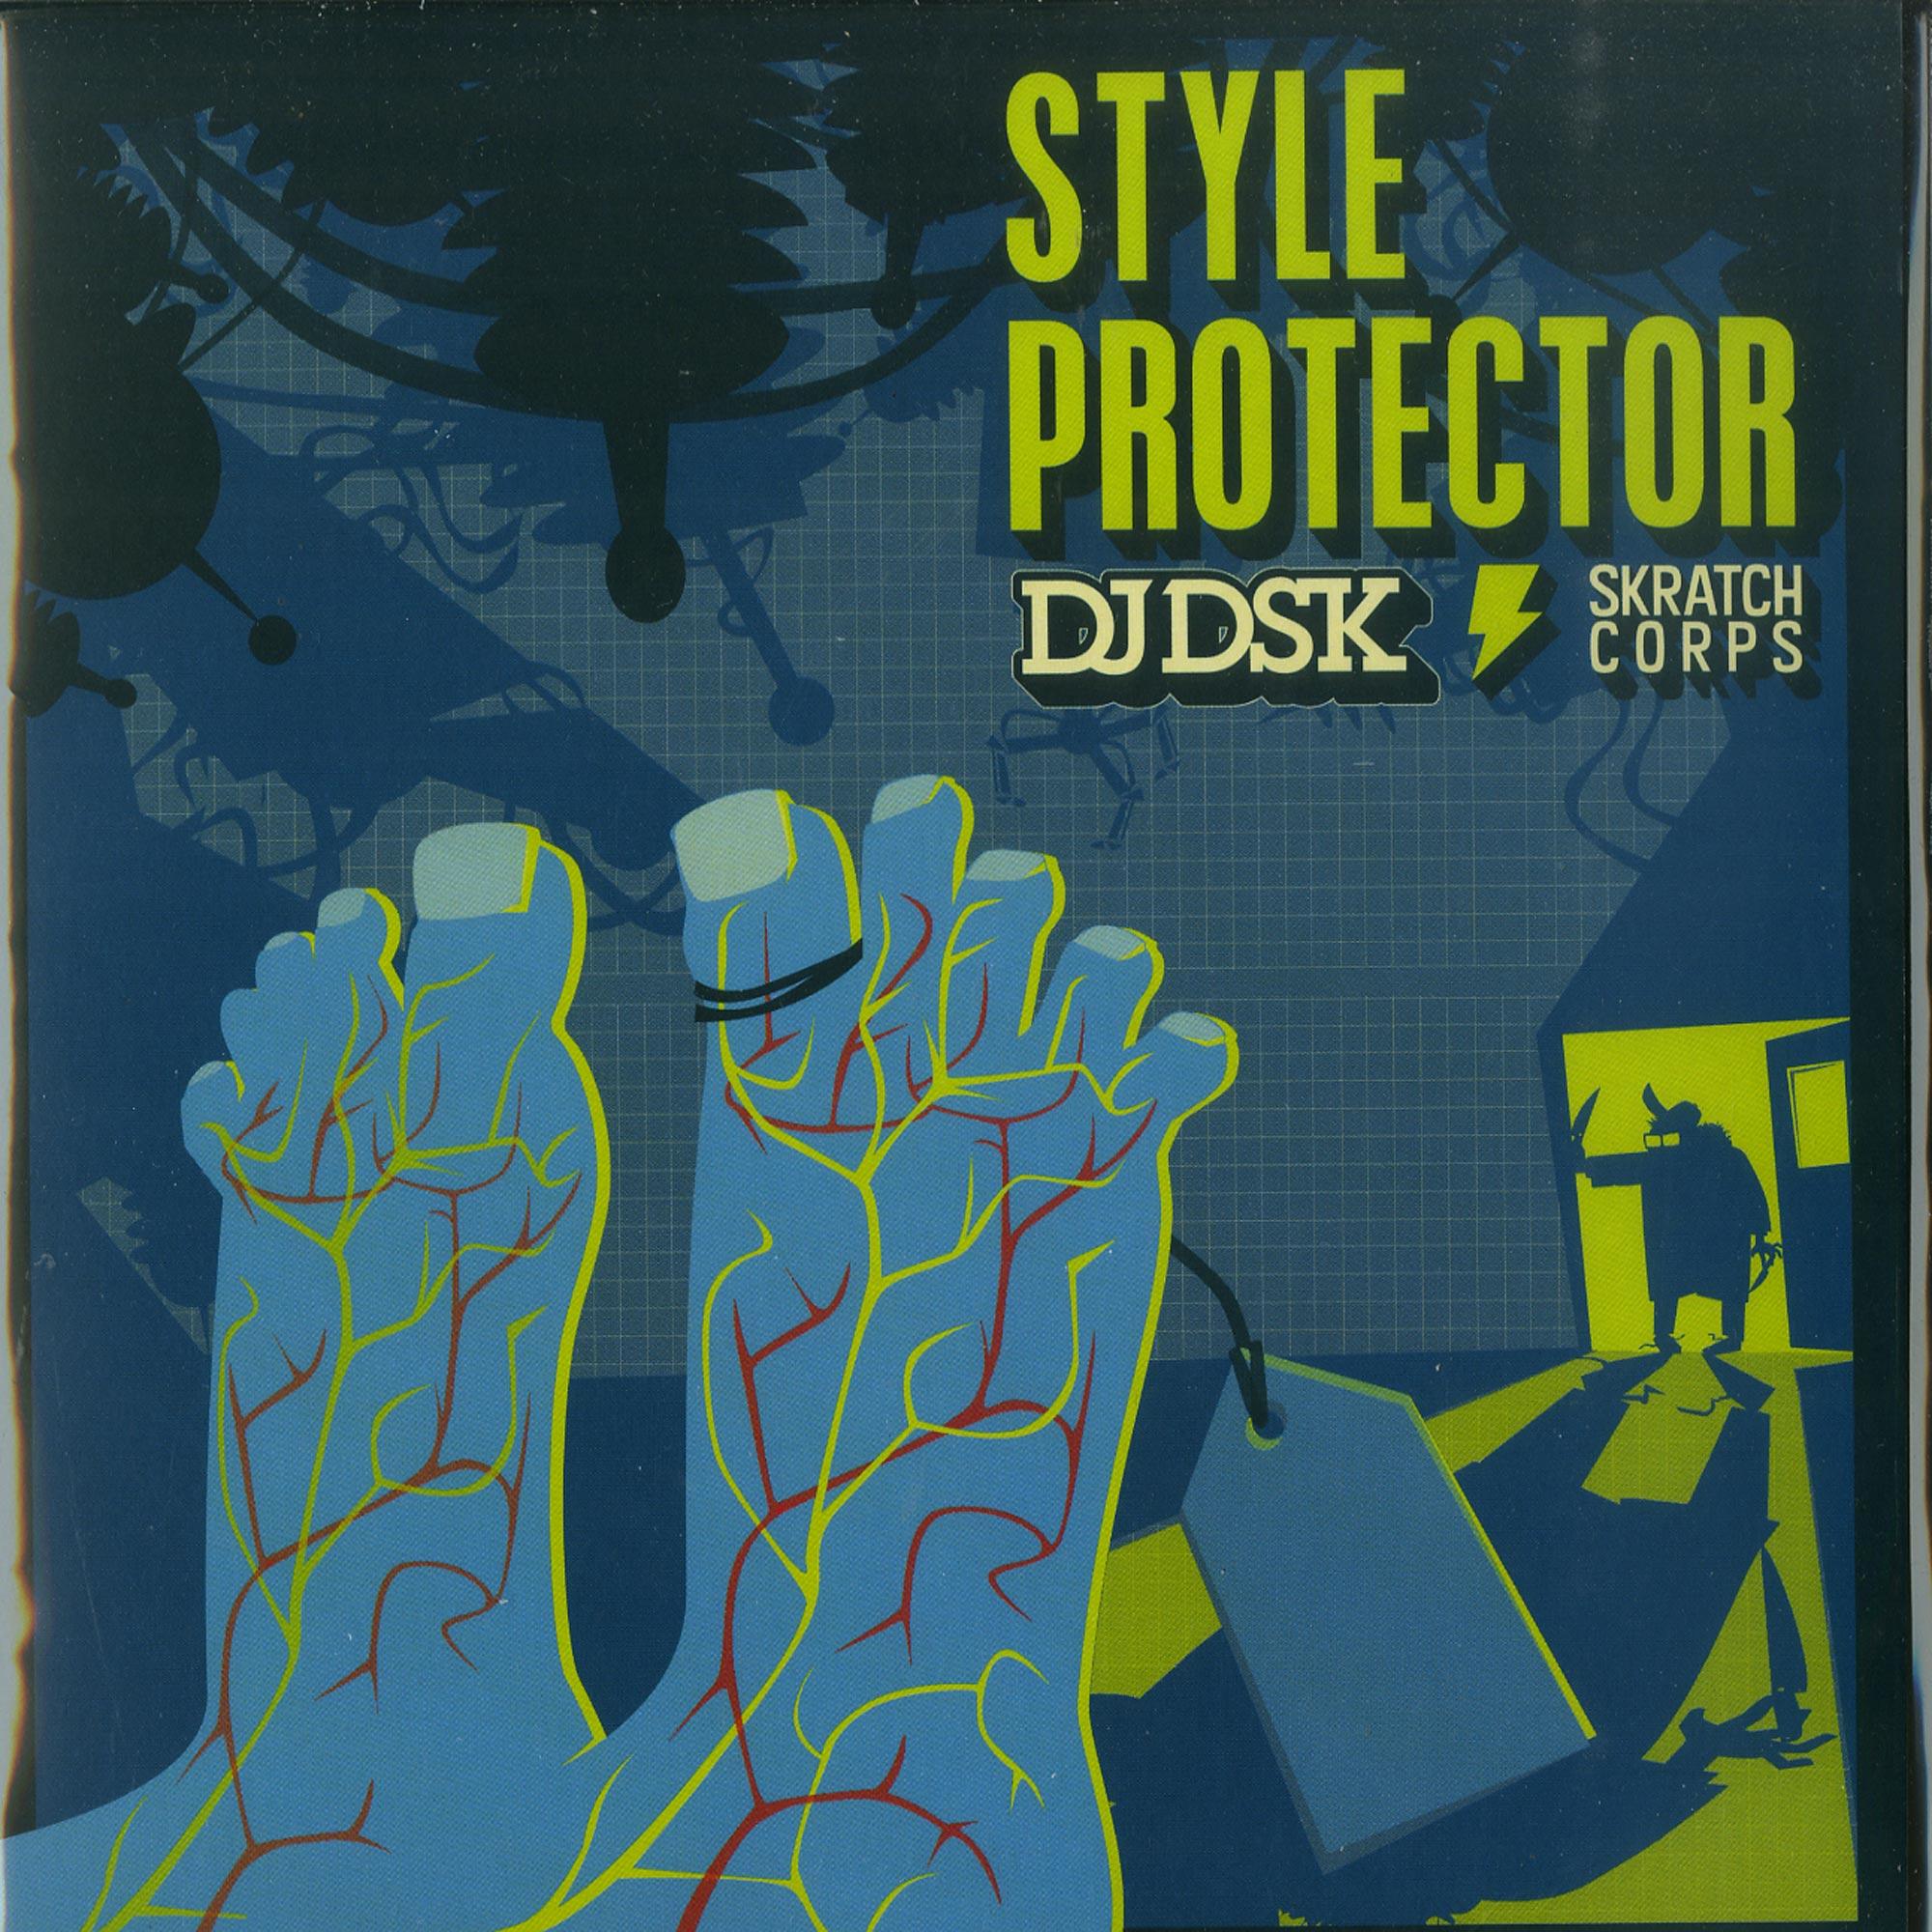 Dj Dsk, Matman, Dj Koncept And Menace - STYLE PROTECTOR